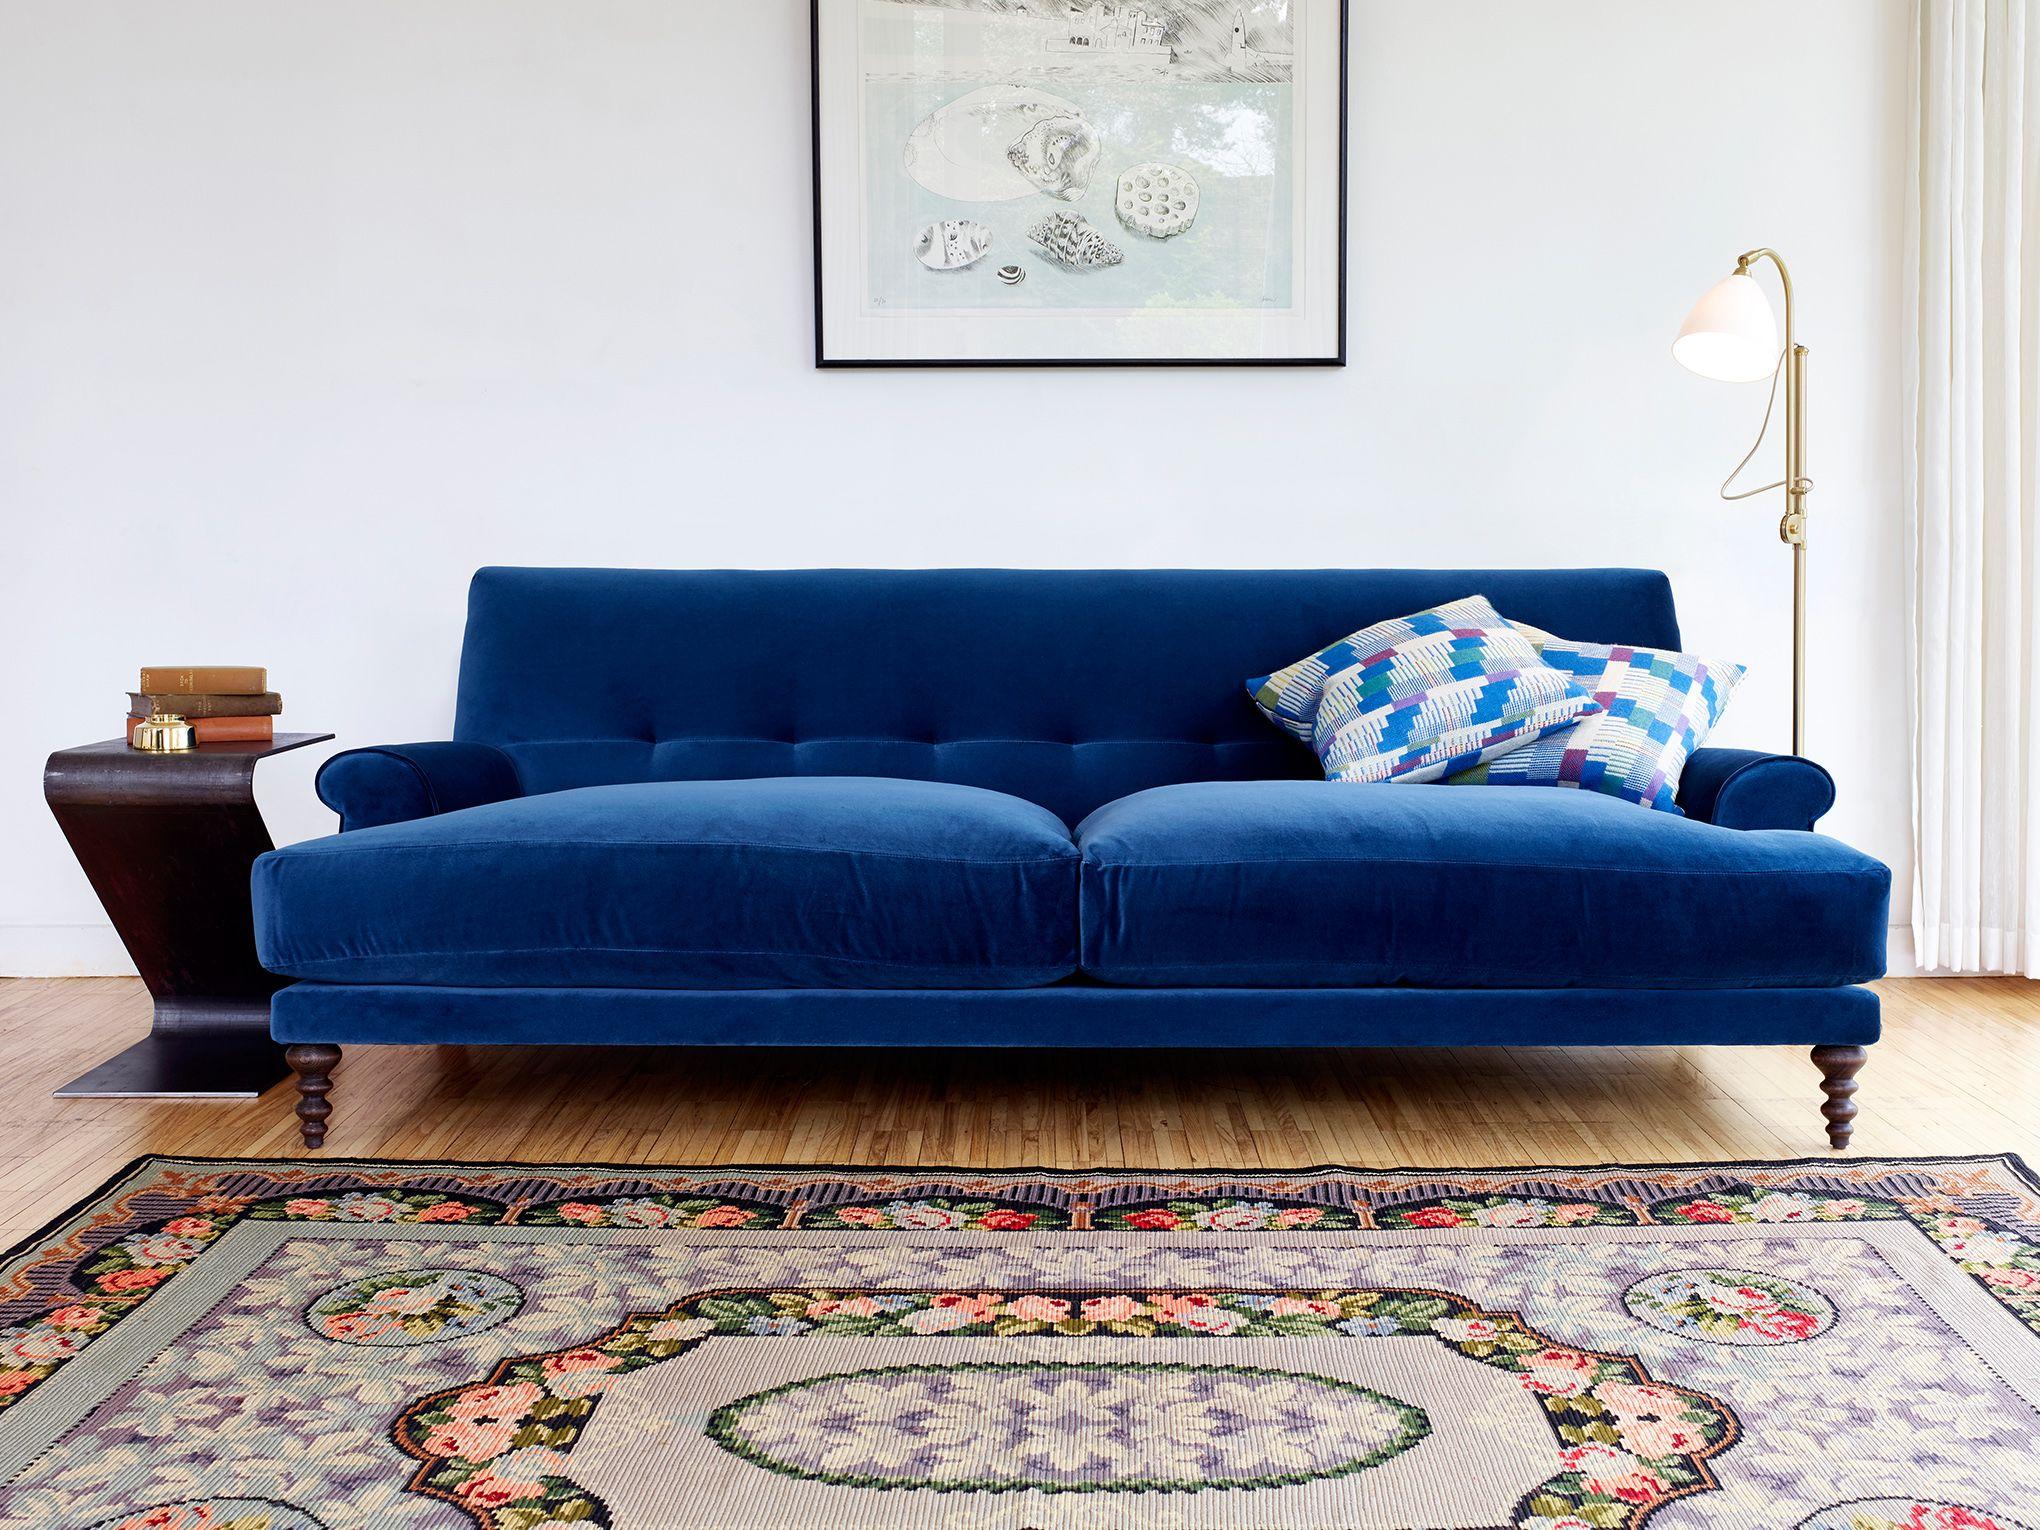 The Oscar Sofa Designed By Matthew Hilton Strikes A